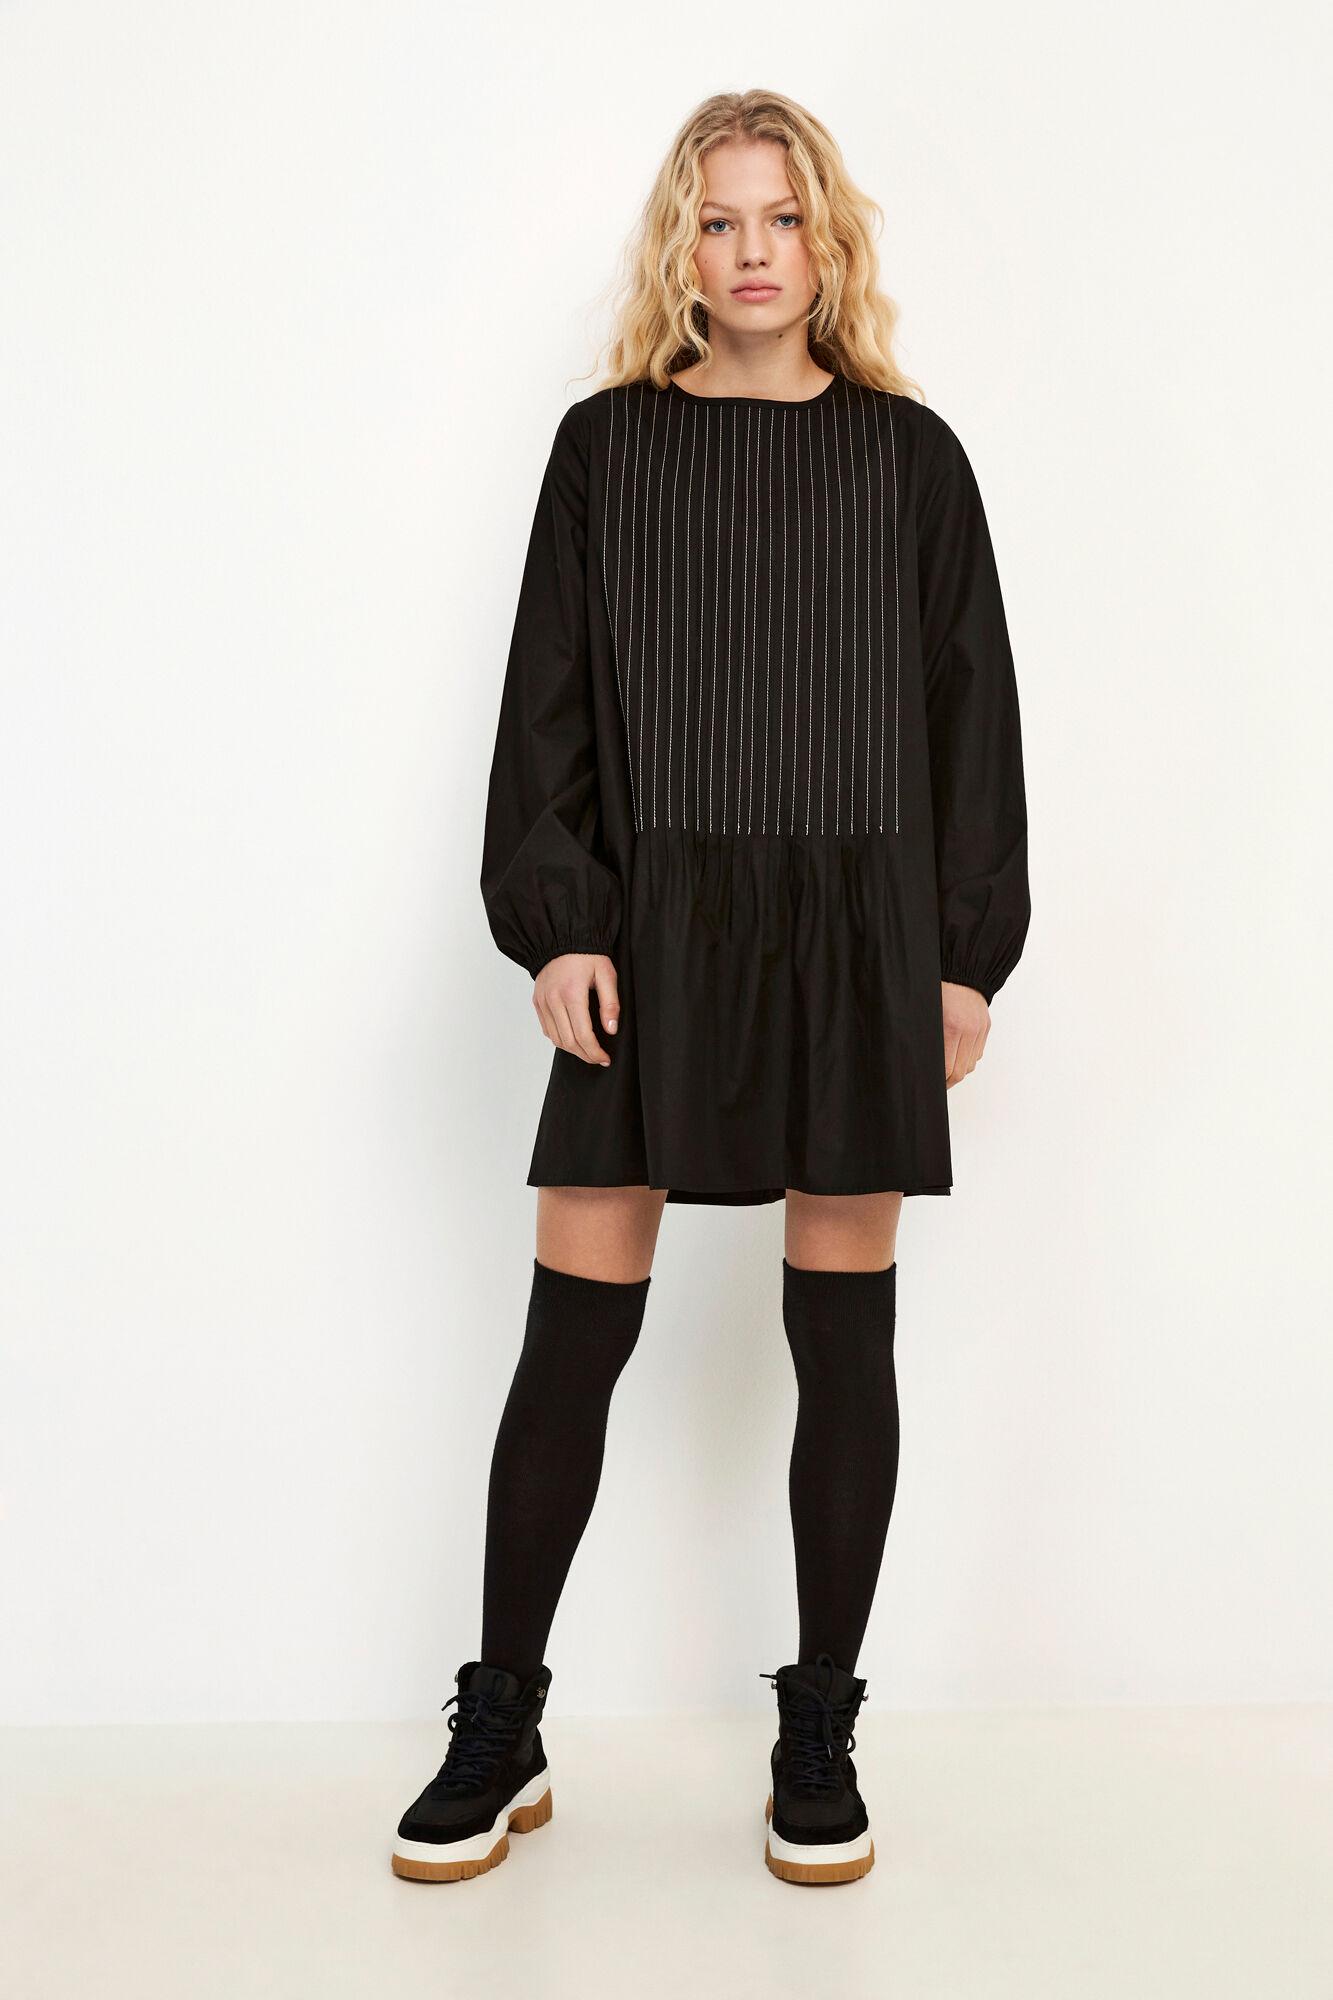 ENTOPAZ LS SHORT DRESS 6691